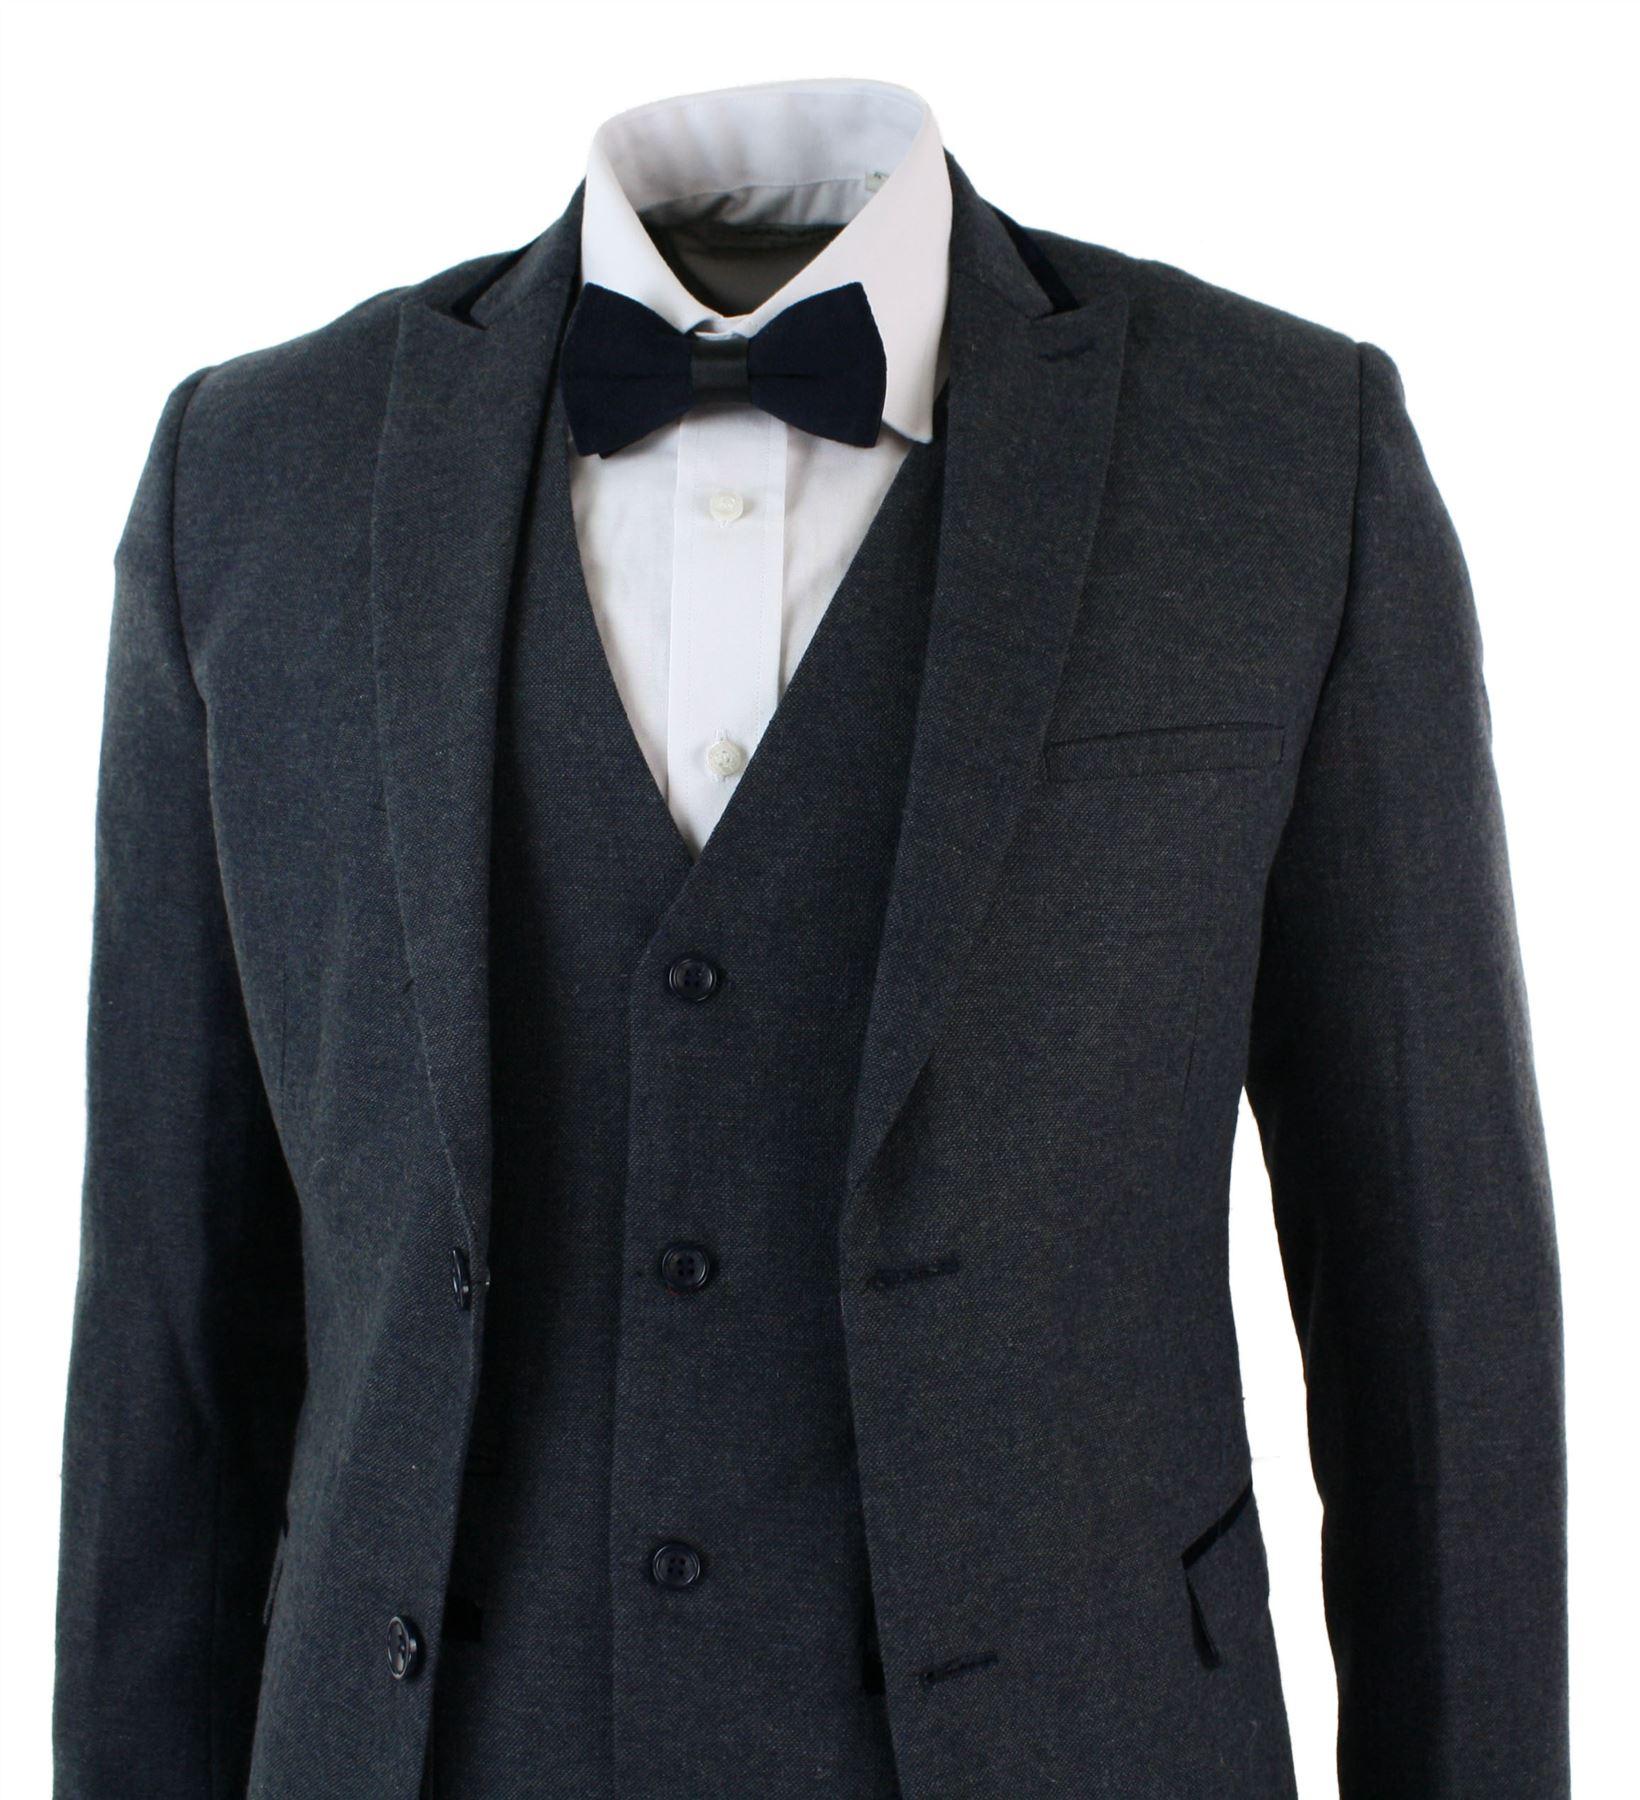 herrenanzug marineblau fischgr te design tweed vintage 3 teiliger anzug ebay. Black Bedroom Furniture Sets. Home Design Ideas